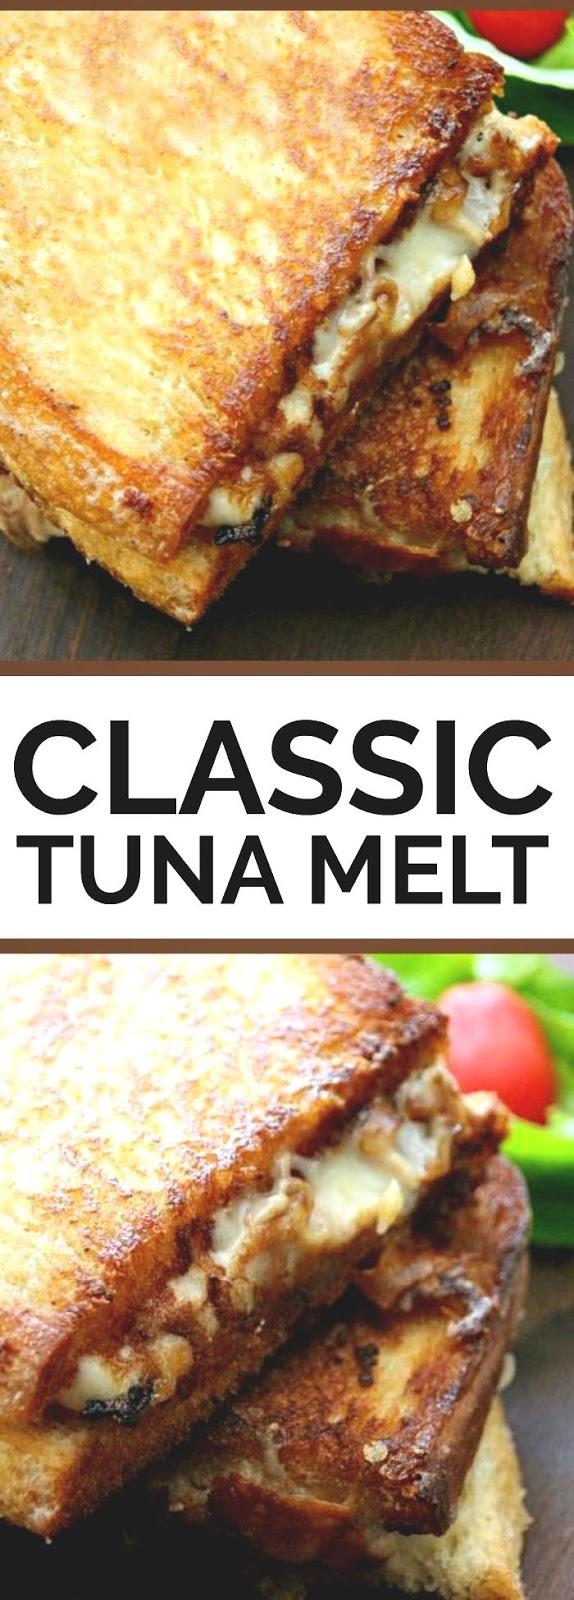 tuna melts recipes